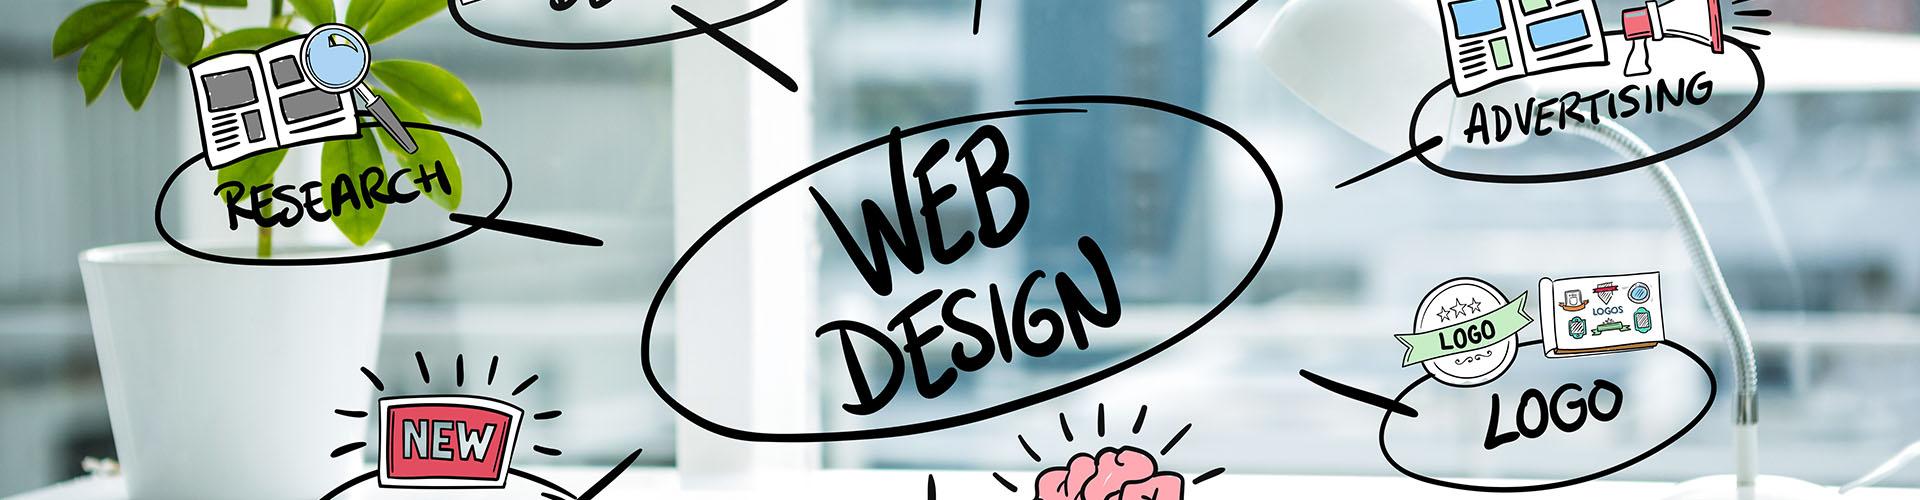 samui graphic web slider design concepts with blurred background